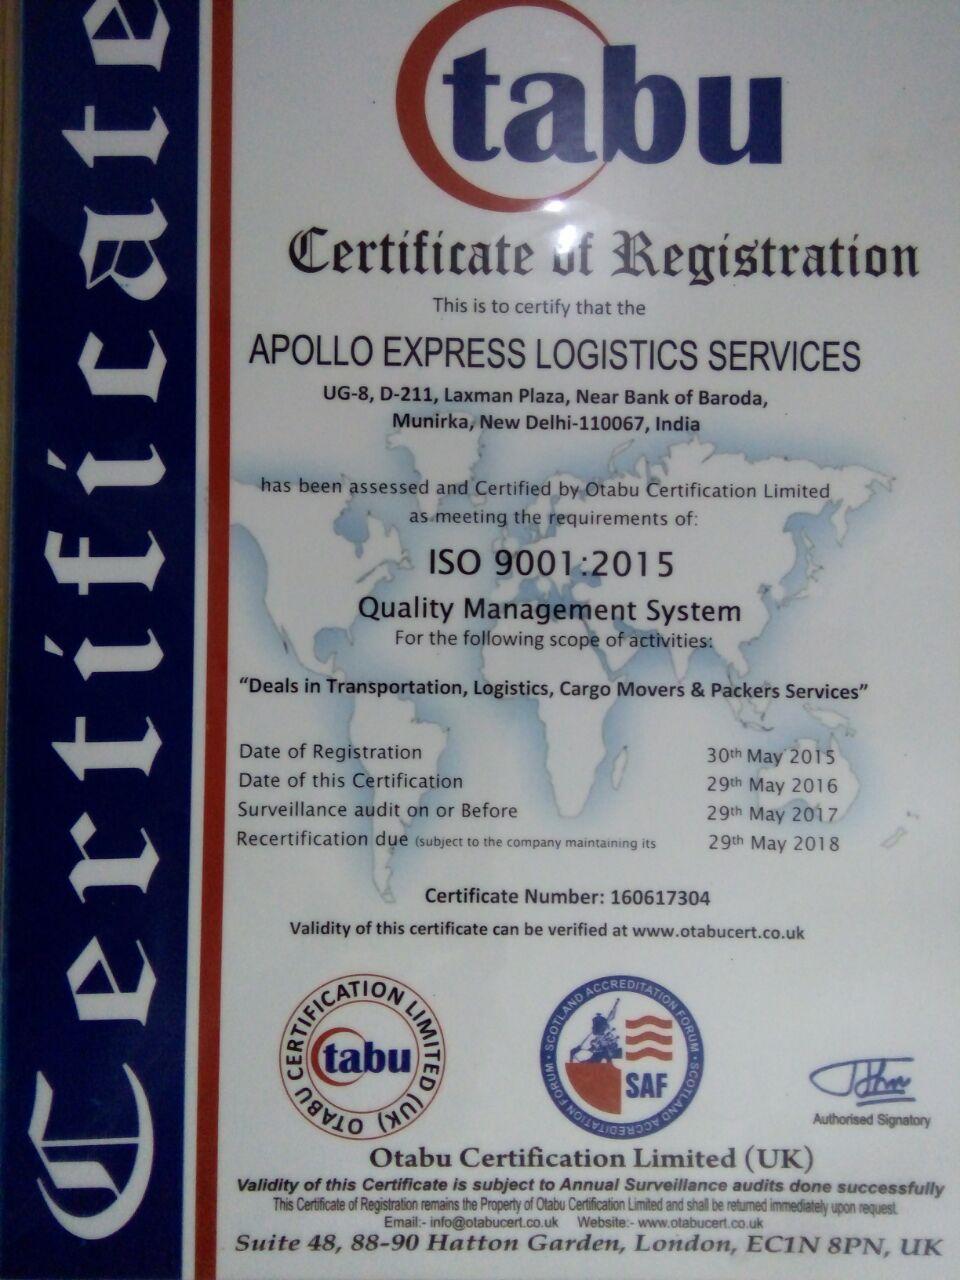 Apollo Express Logistics Services in Munirka, Delhi-110067